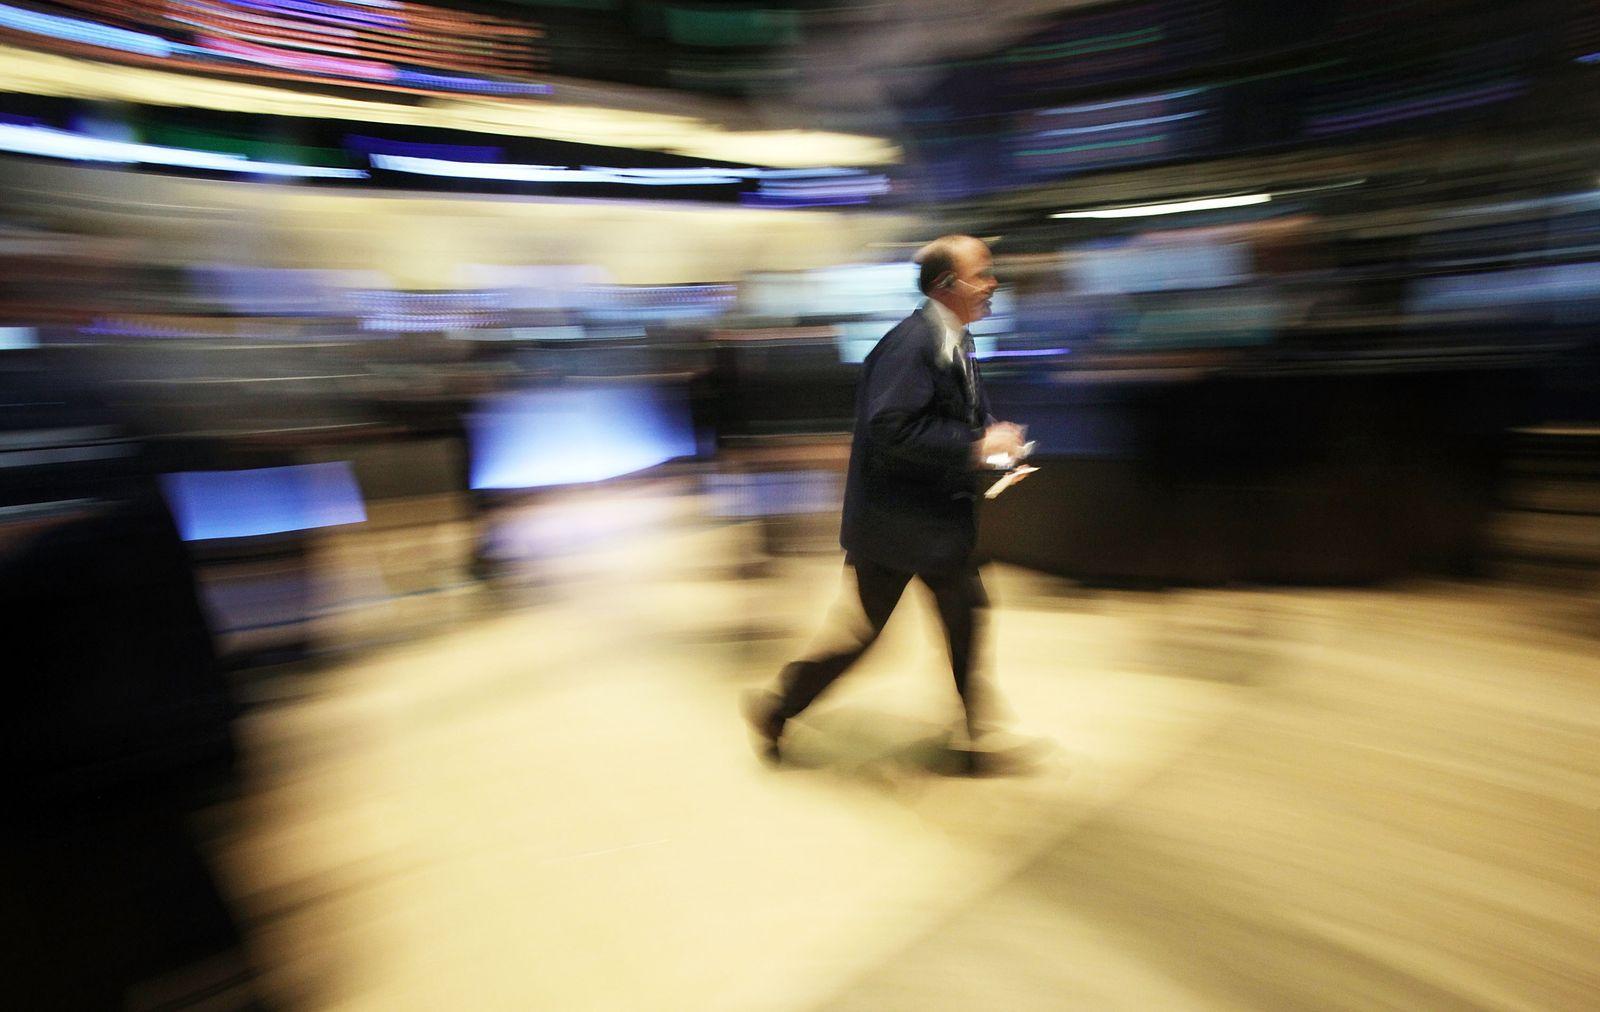 Finanzmarkt / Krise / Börse